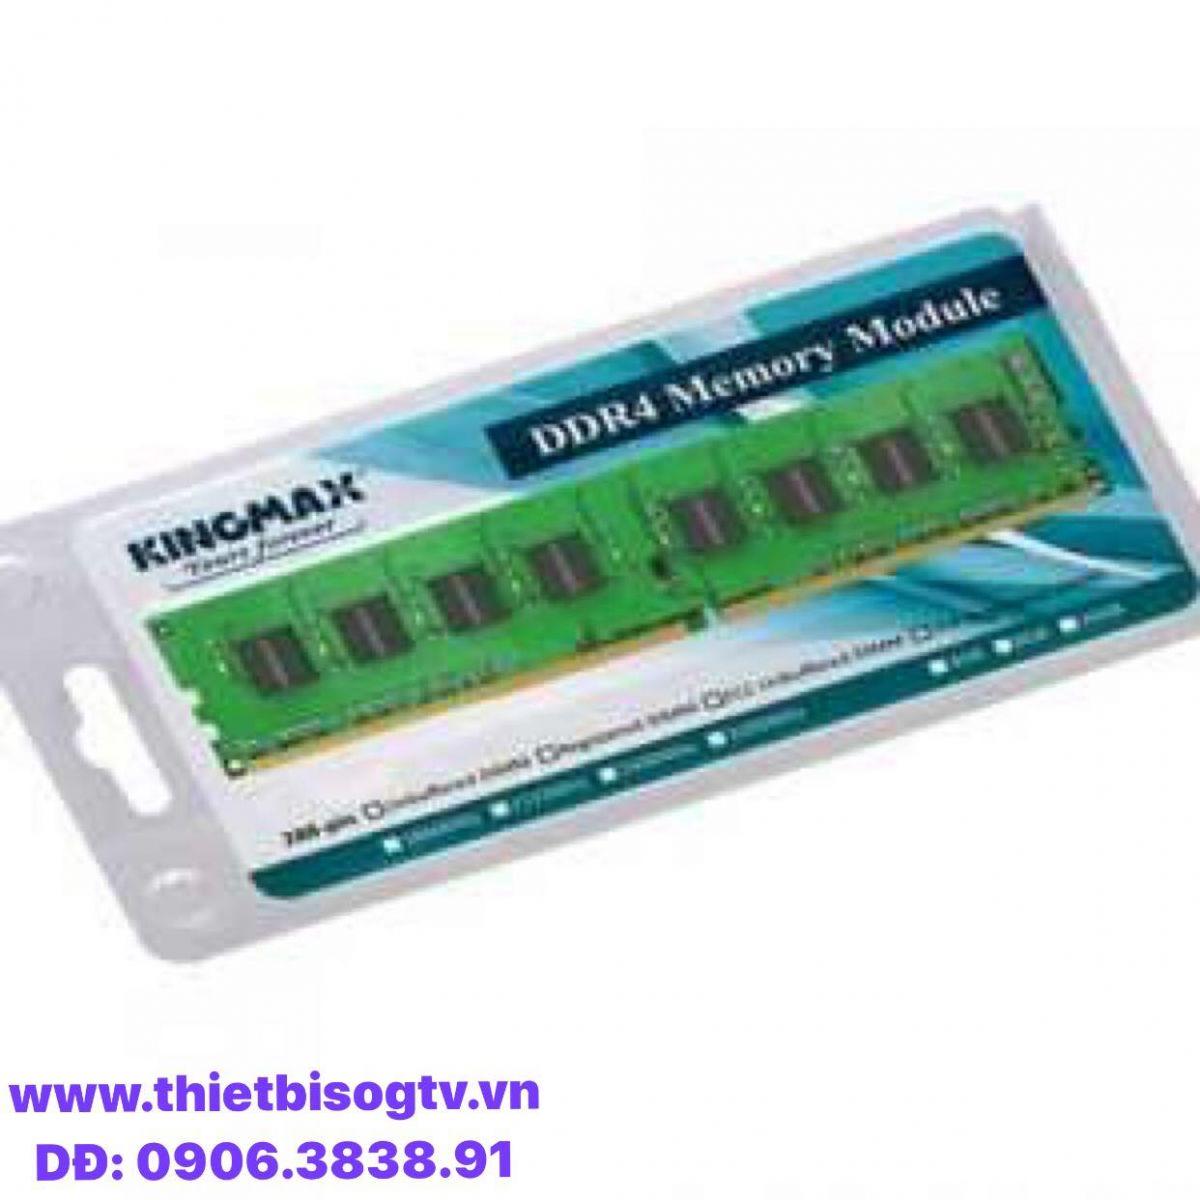 Bộ nhớ DDR4 Kingmax 4GB bus 2400